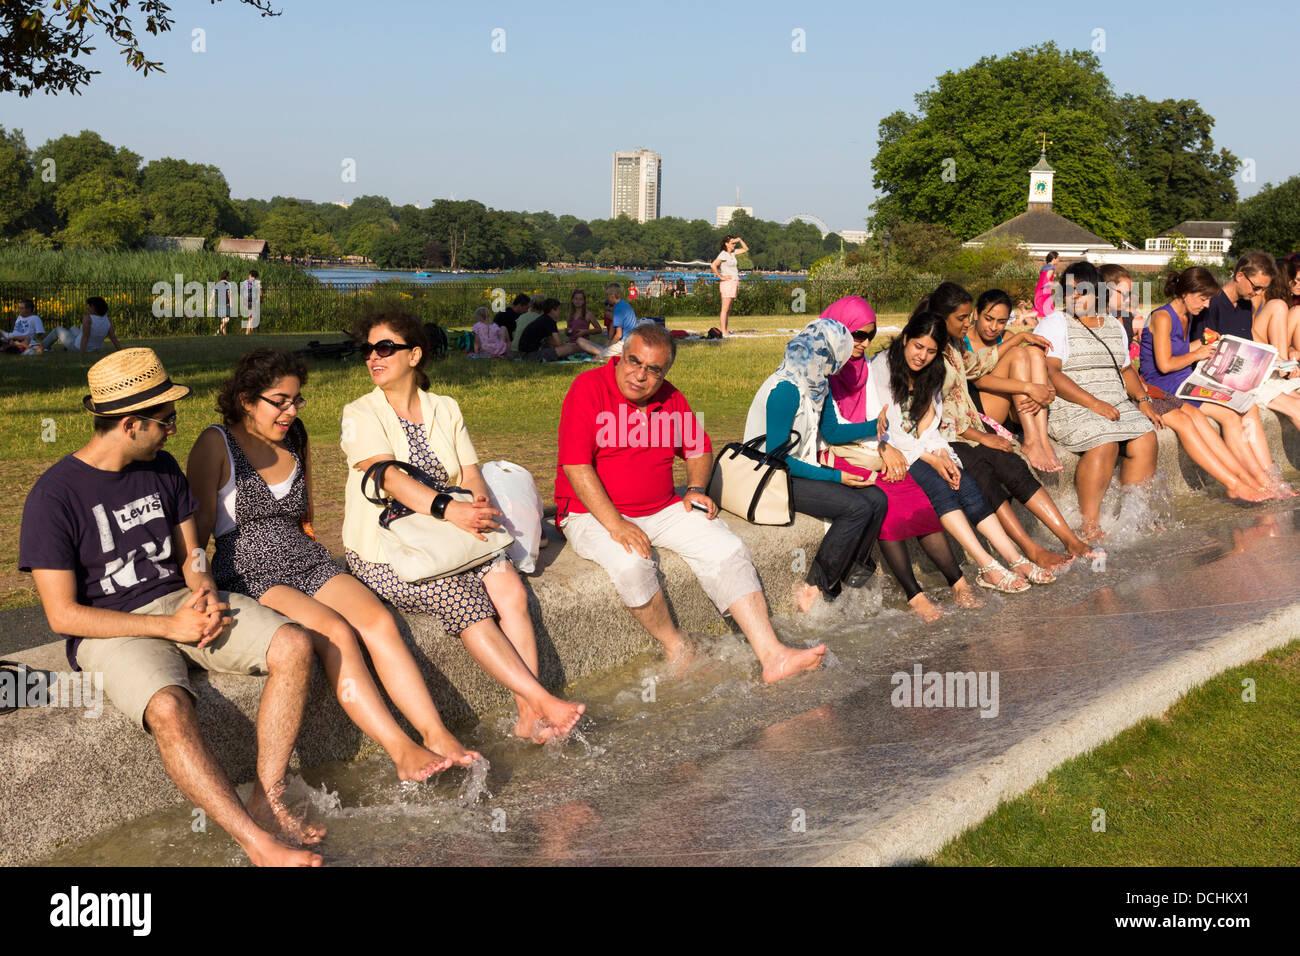 Princess Diana Memorial Fountain during Heatwave - Hyde Park - London - Stock Image